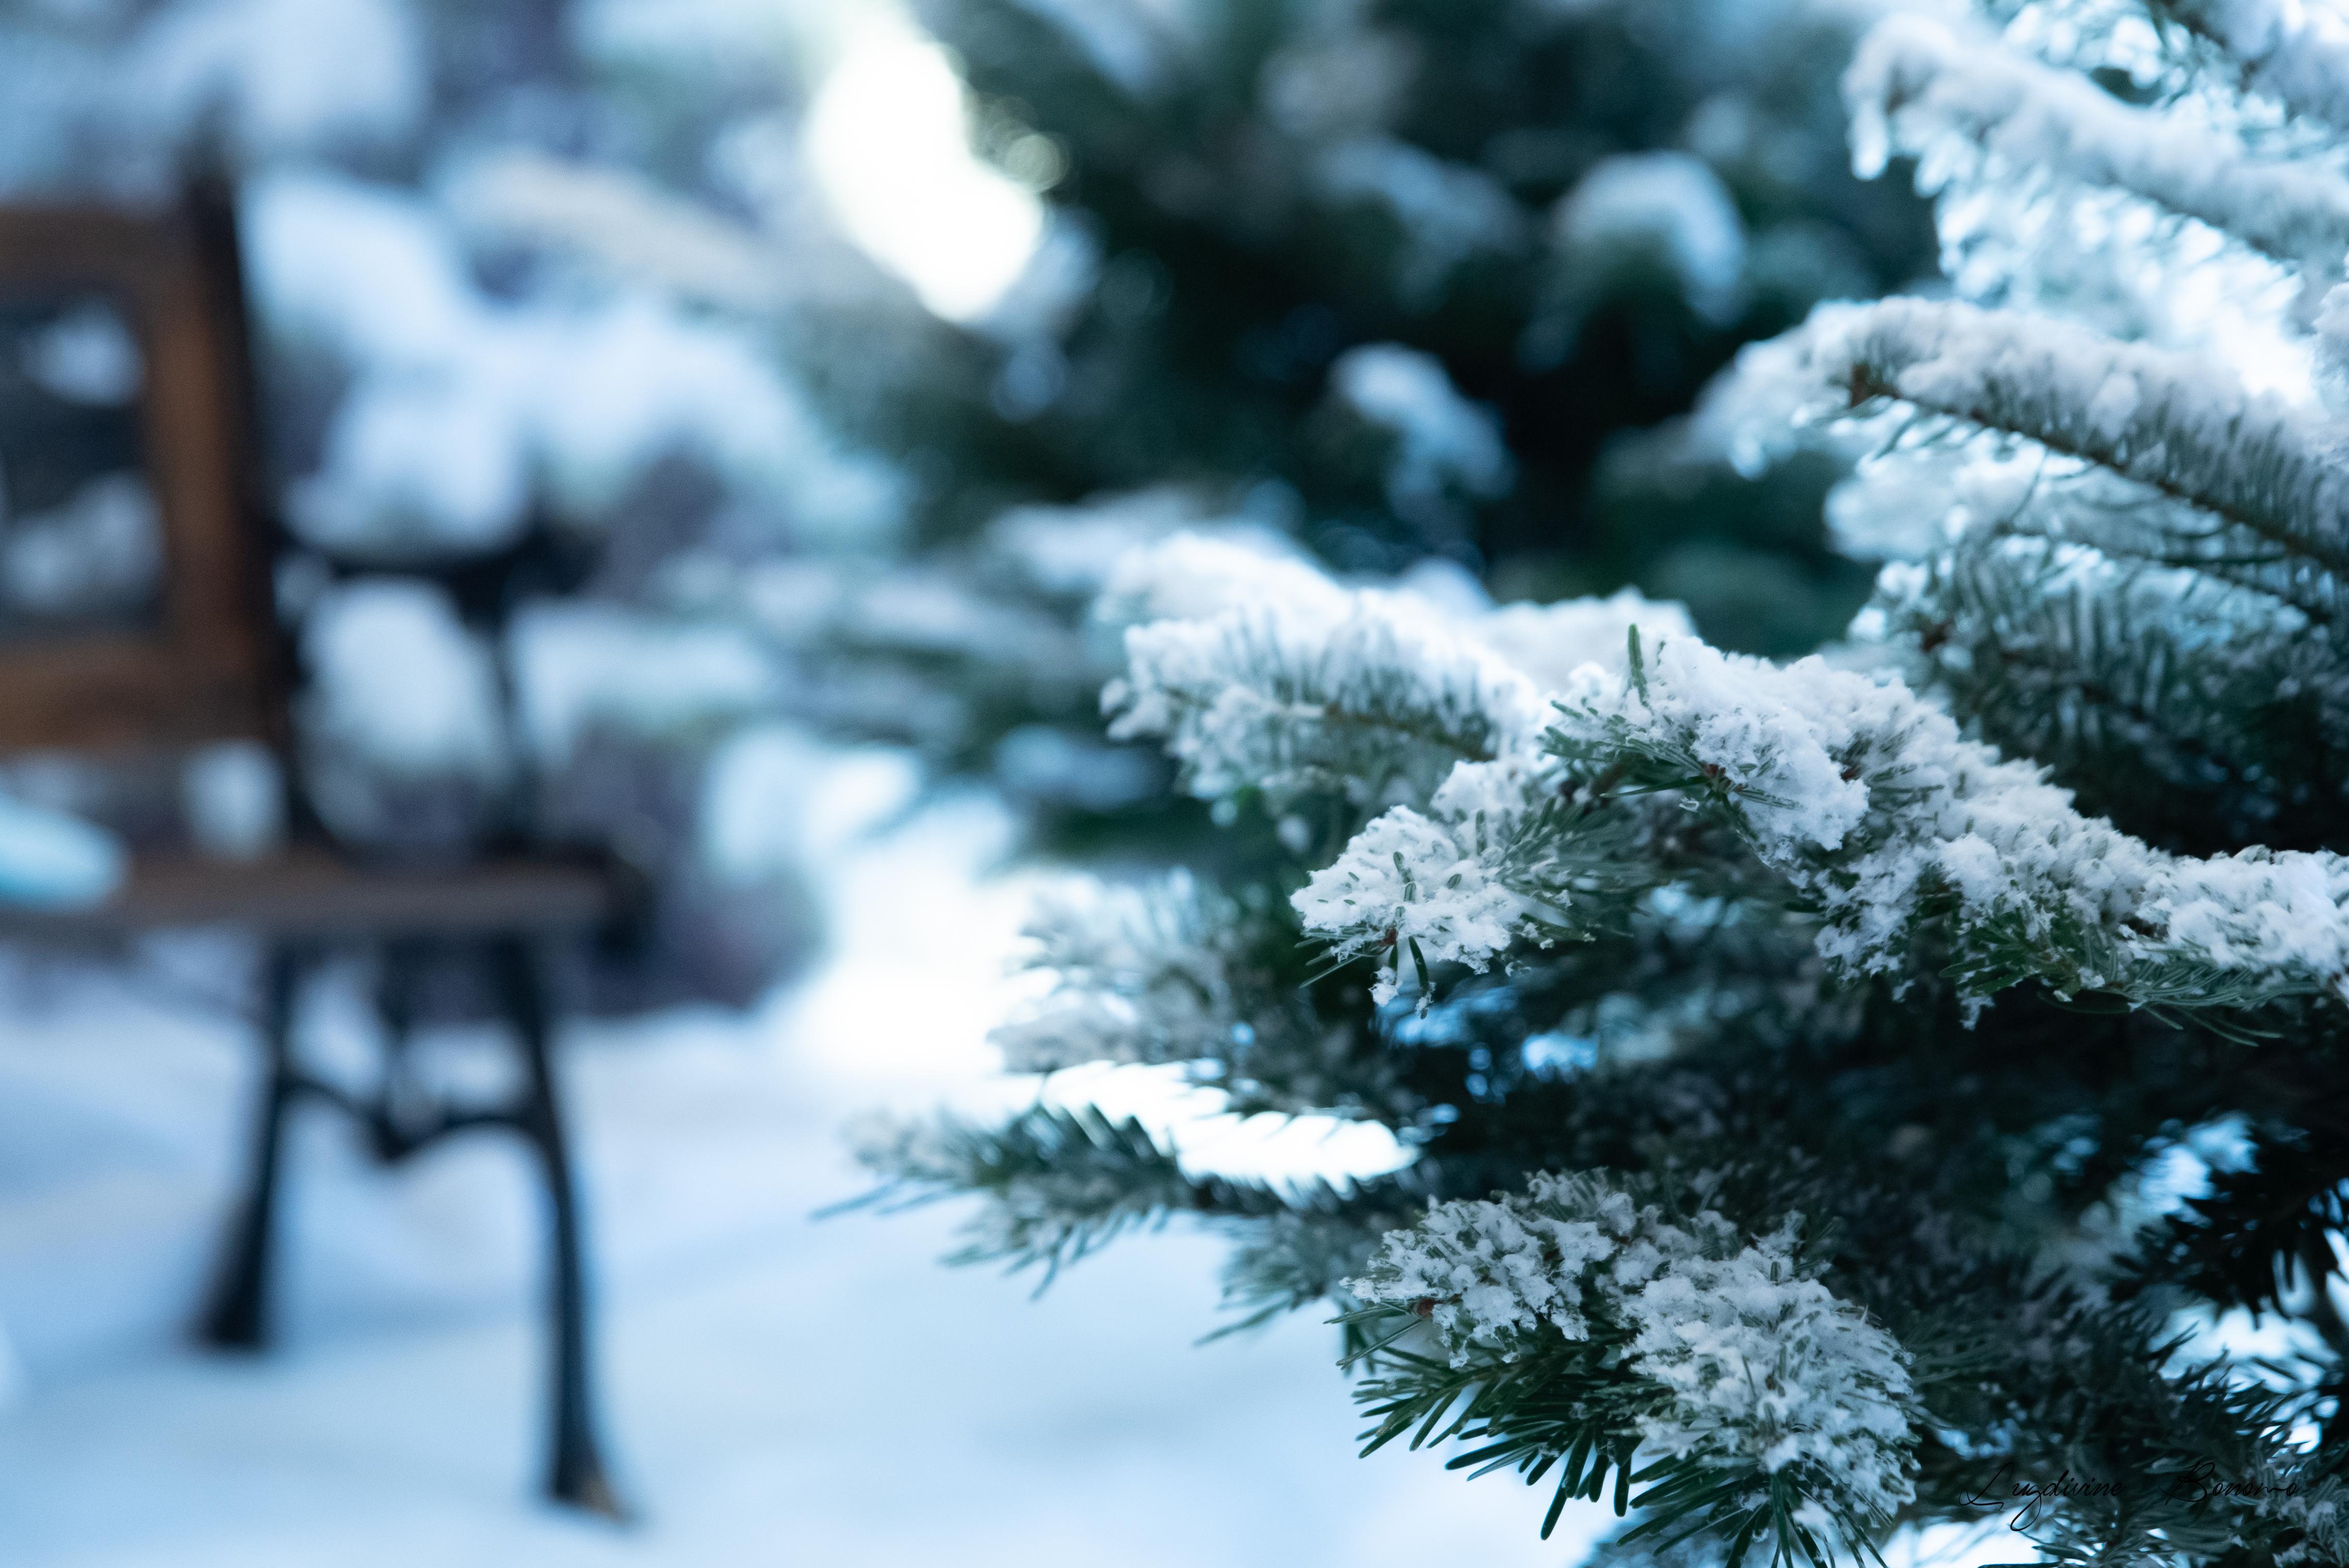 séance photo noël neige 2019